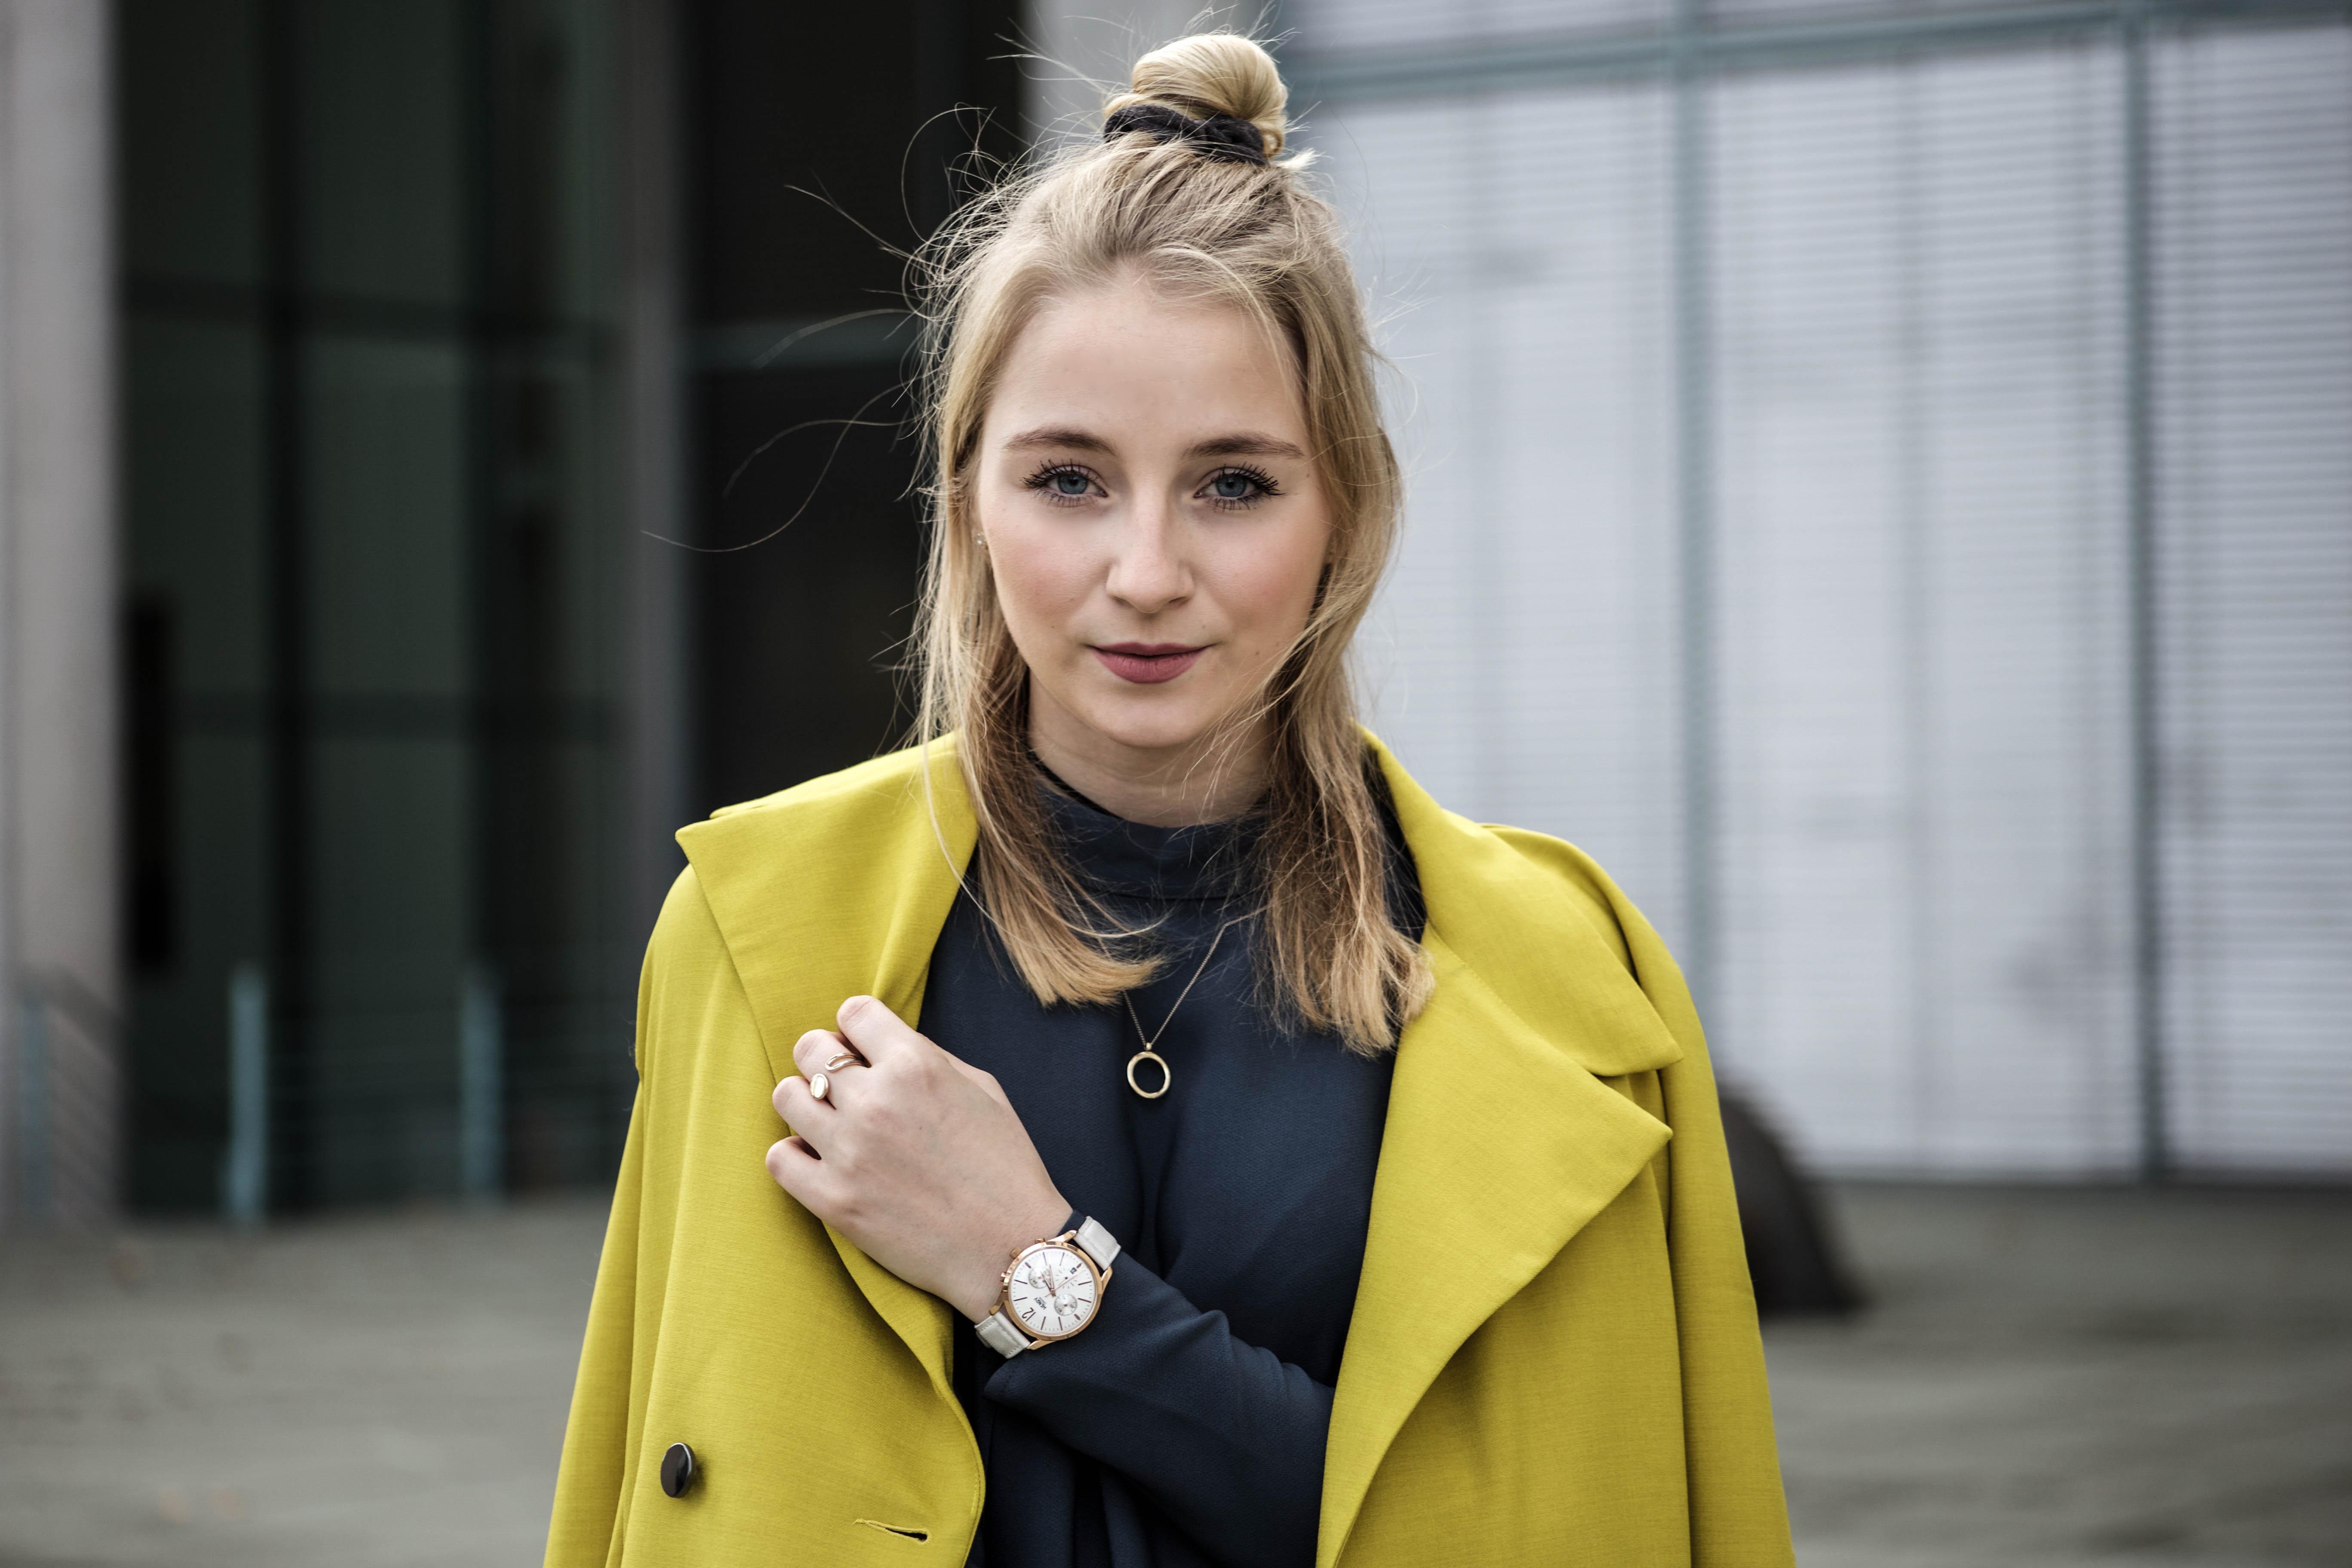 lemon-coat-volantkleid-herbstoutfit-fashionblog-modeblog-koeln-bonn-berlin_8147